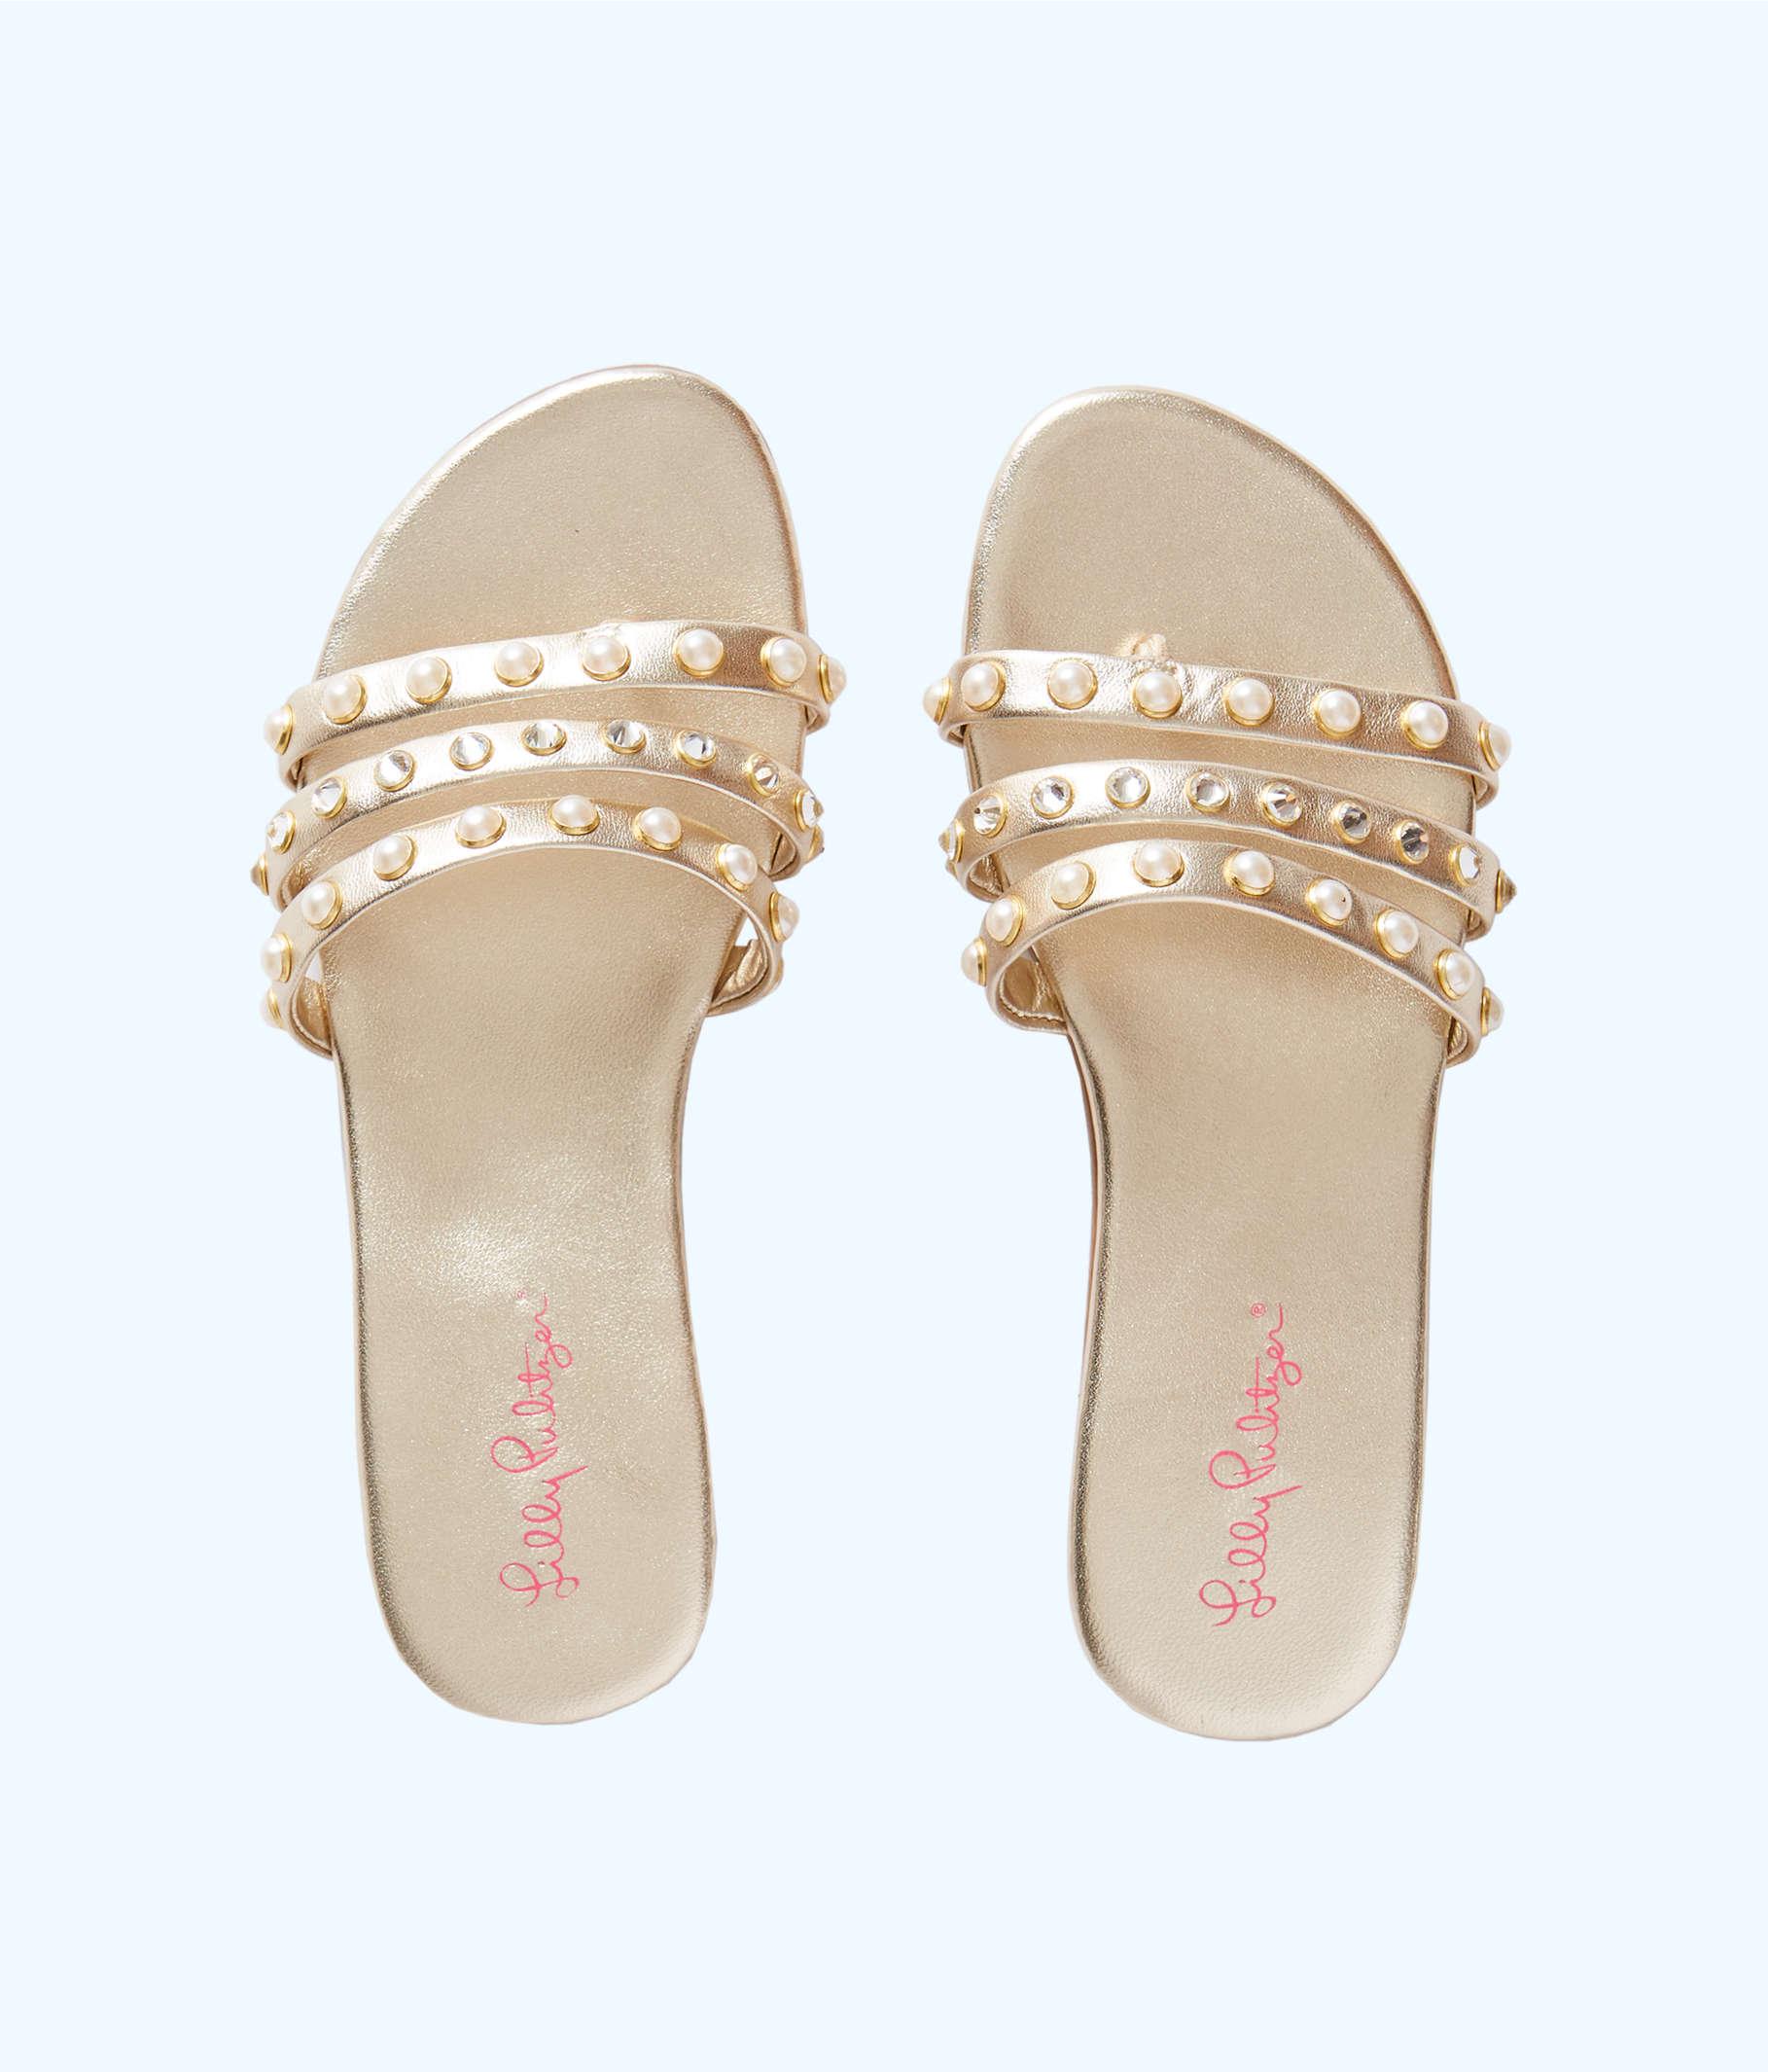 b7bab234165aad ... Tabbie Embellished Sandal, Gold Metallic, large ...